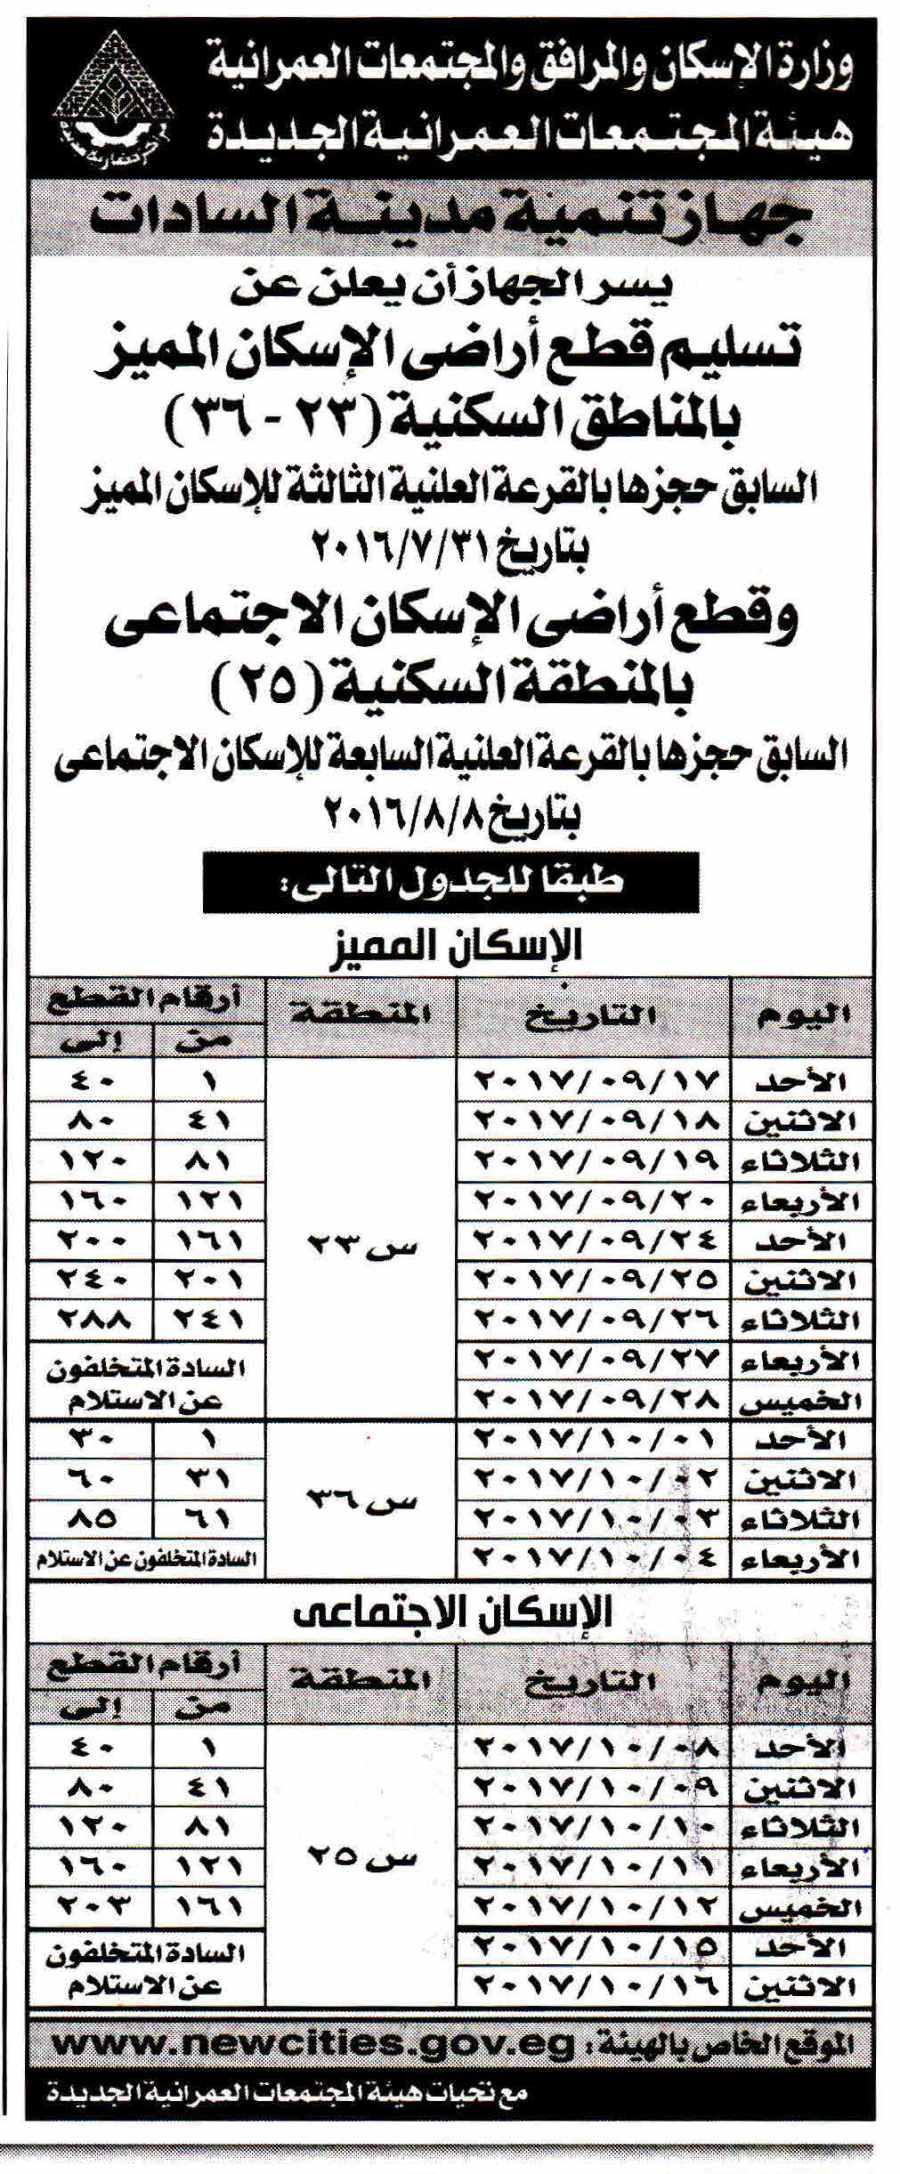 Al Ahram 30 Aug P.1..jpg